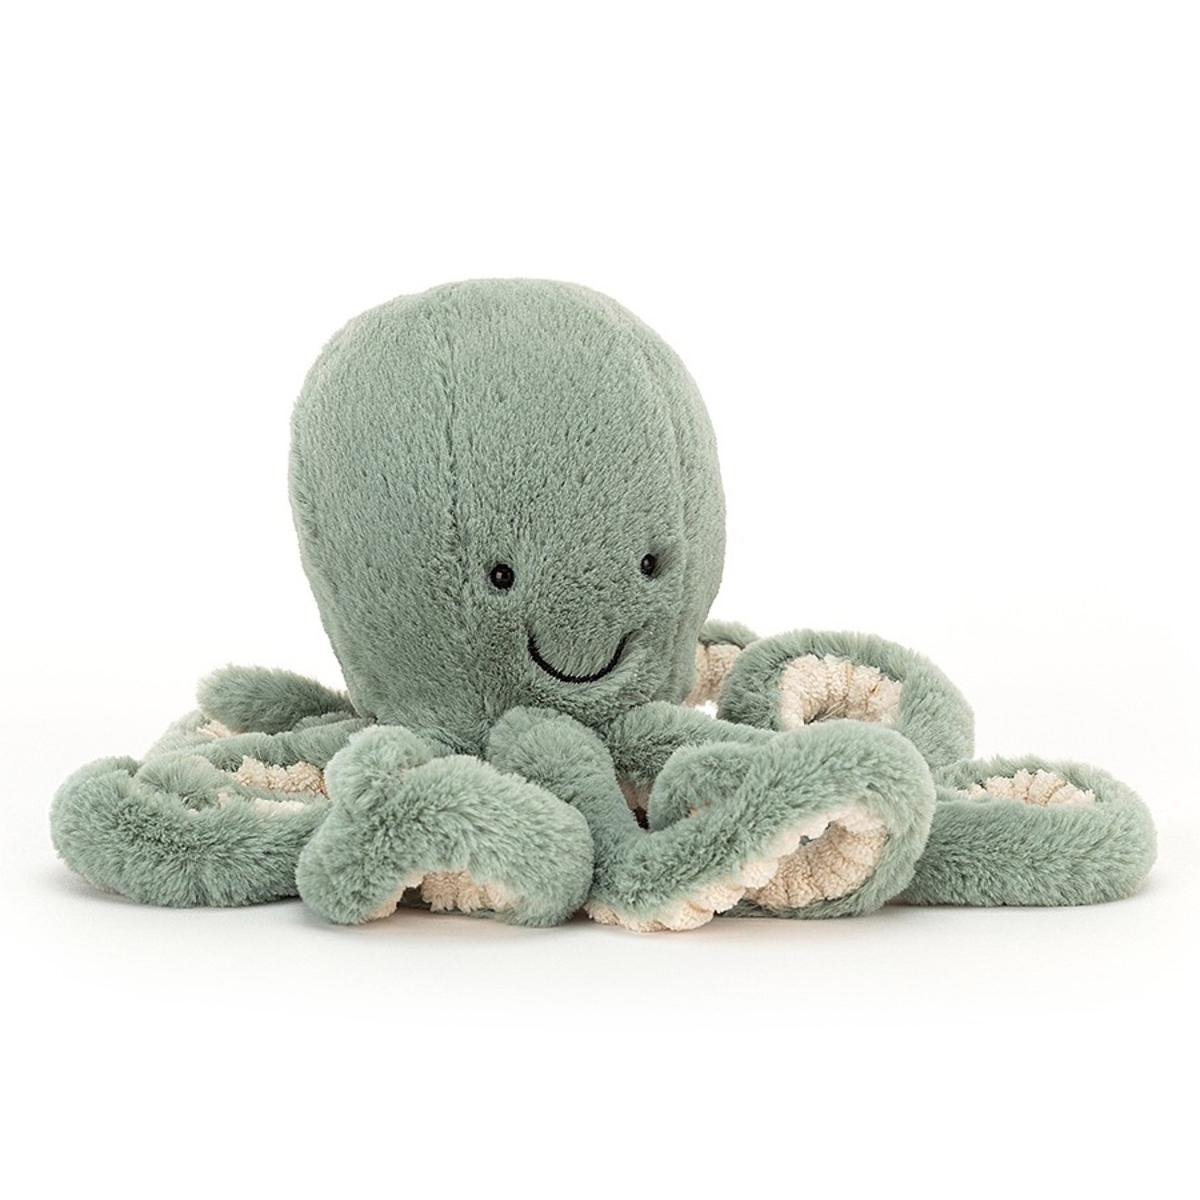 Peluche Odyssey Octopus - Small Peluche Pieuvre 23 cm